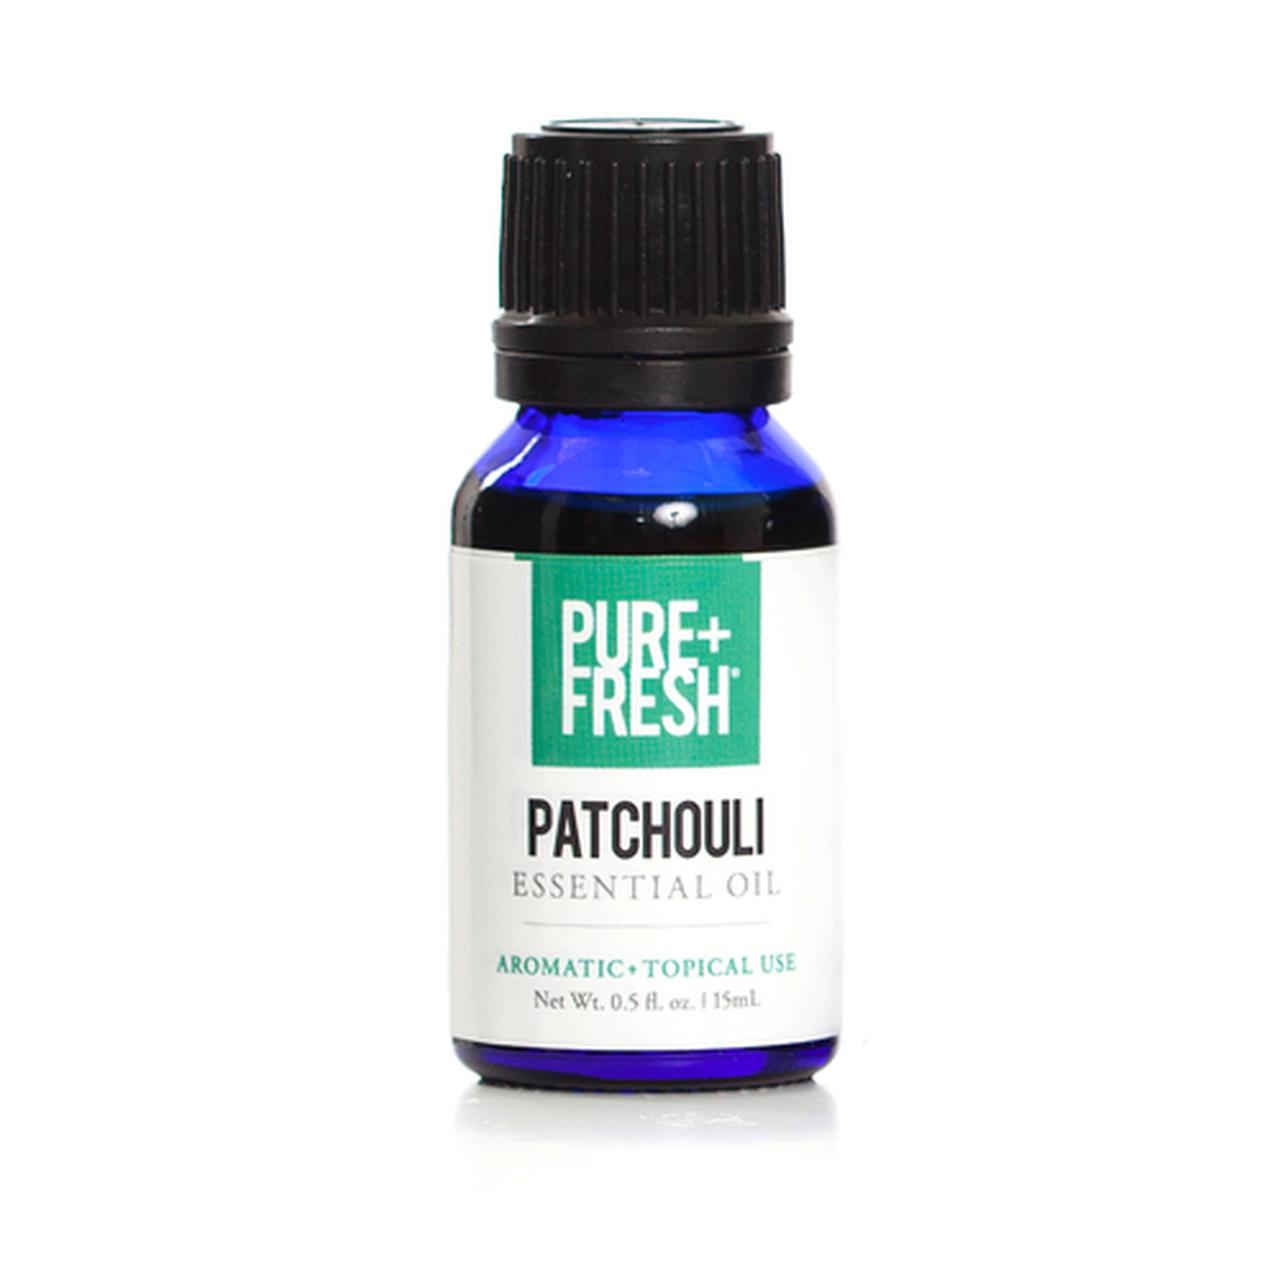 0.5fl oz. Bottle of Pure+Fresh Patchouli Essential Oil